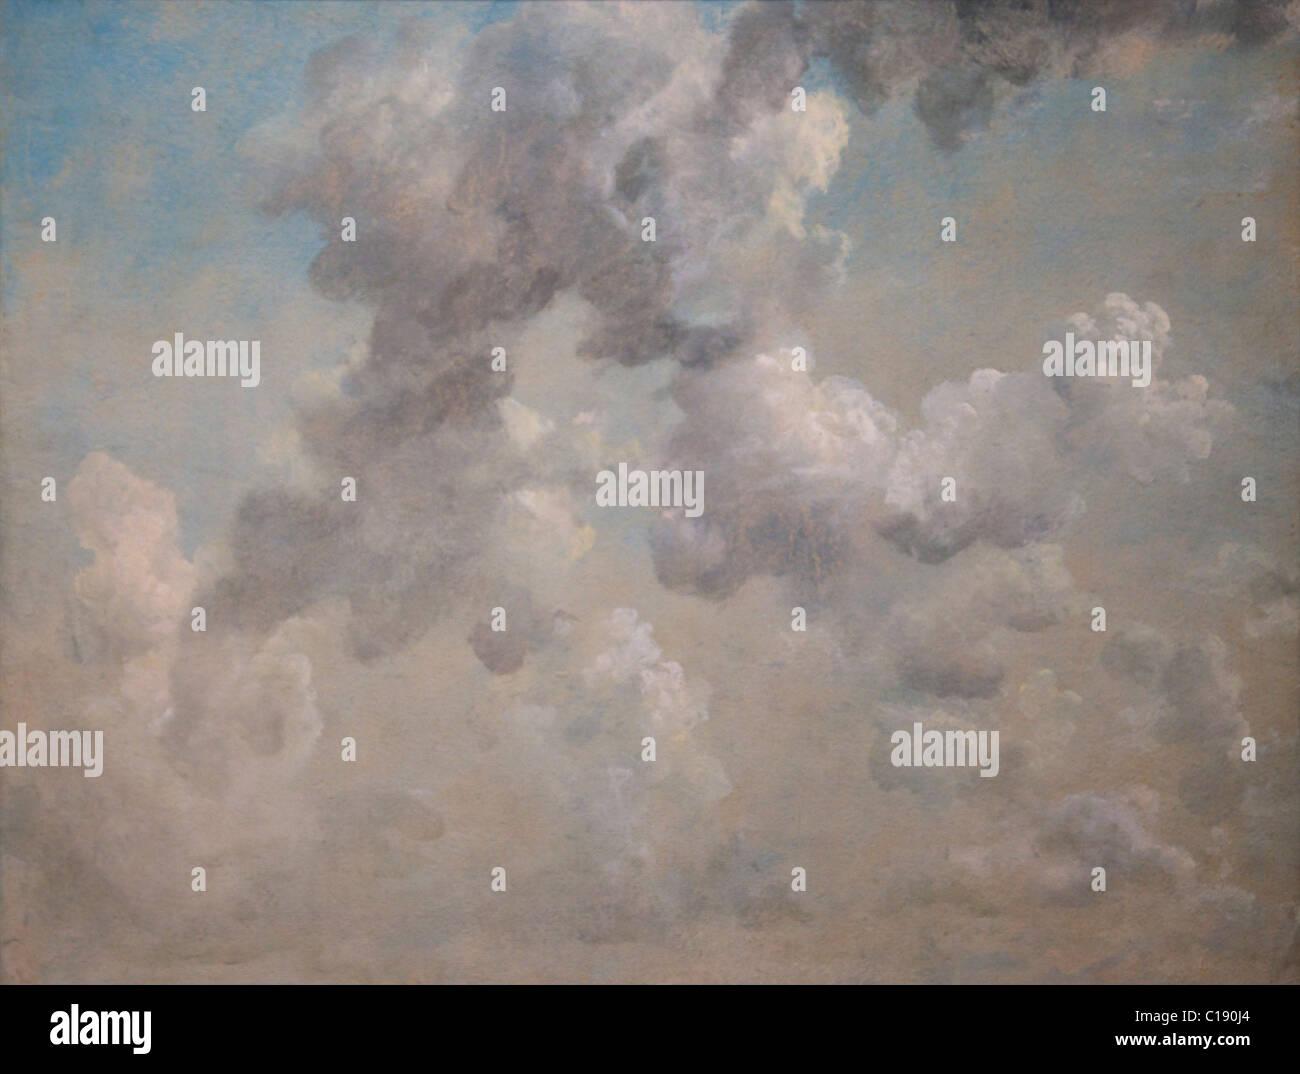 Studium der Wolken, von John Constable, 1822, Ashmolean Museum of Art, University of Oxford, Oxfordshire, England, Stockbild